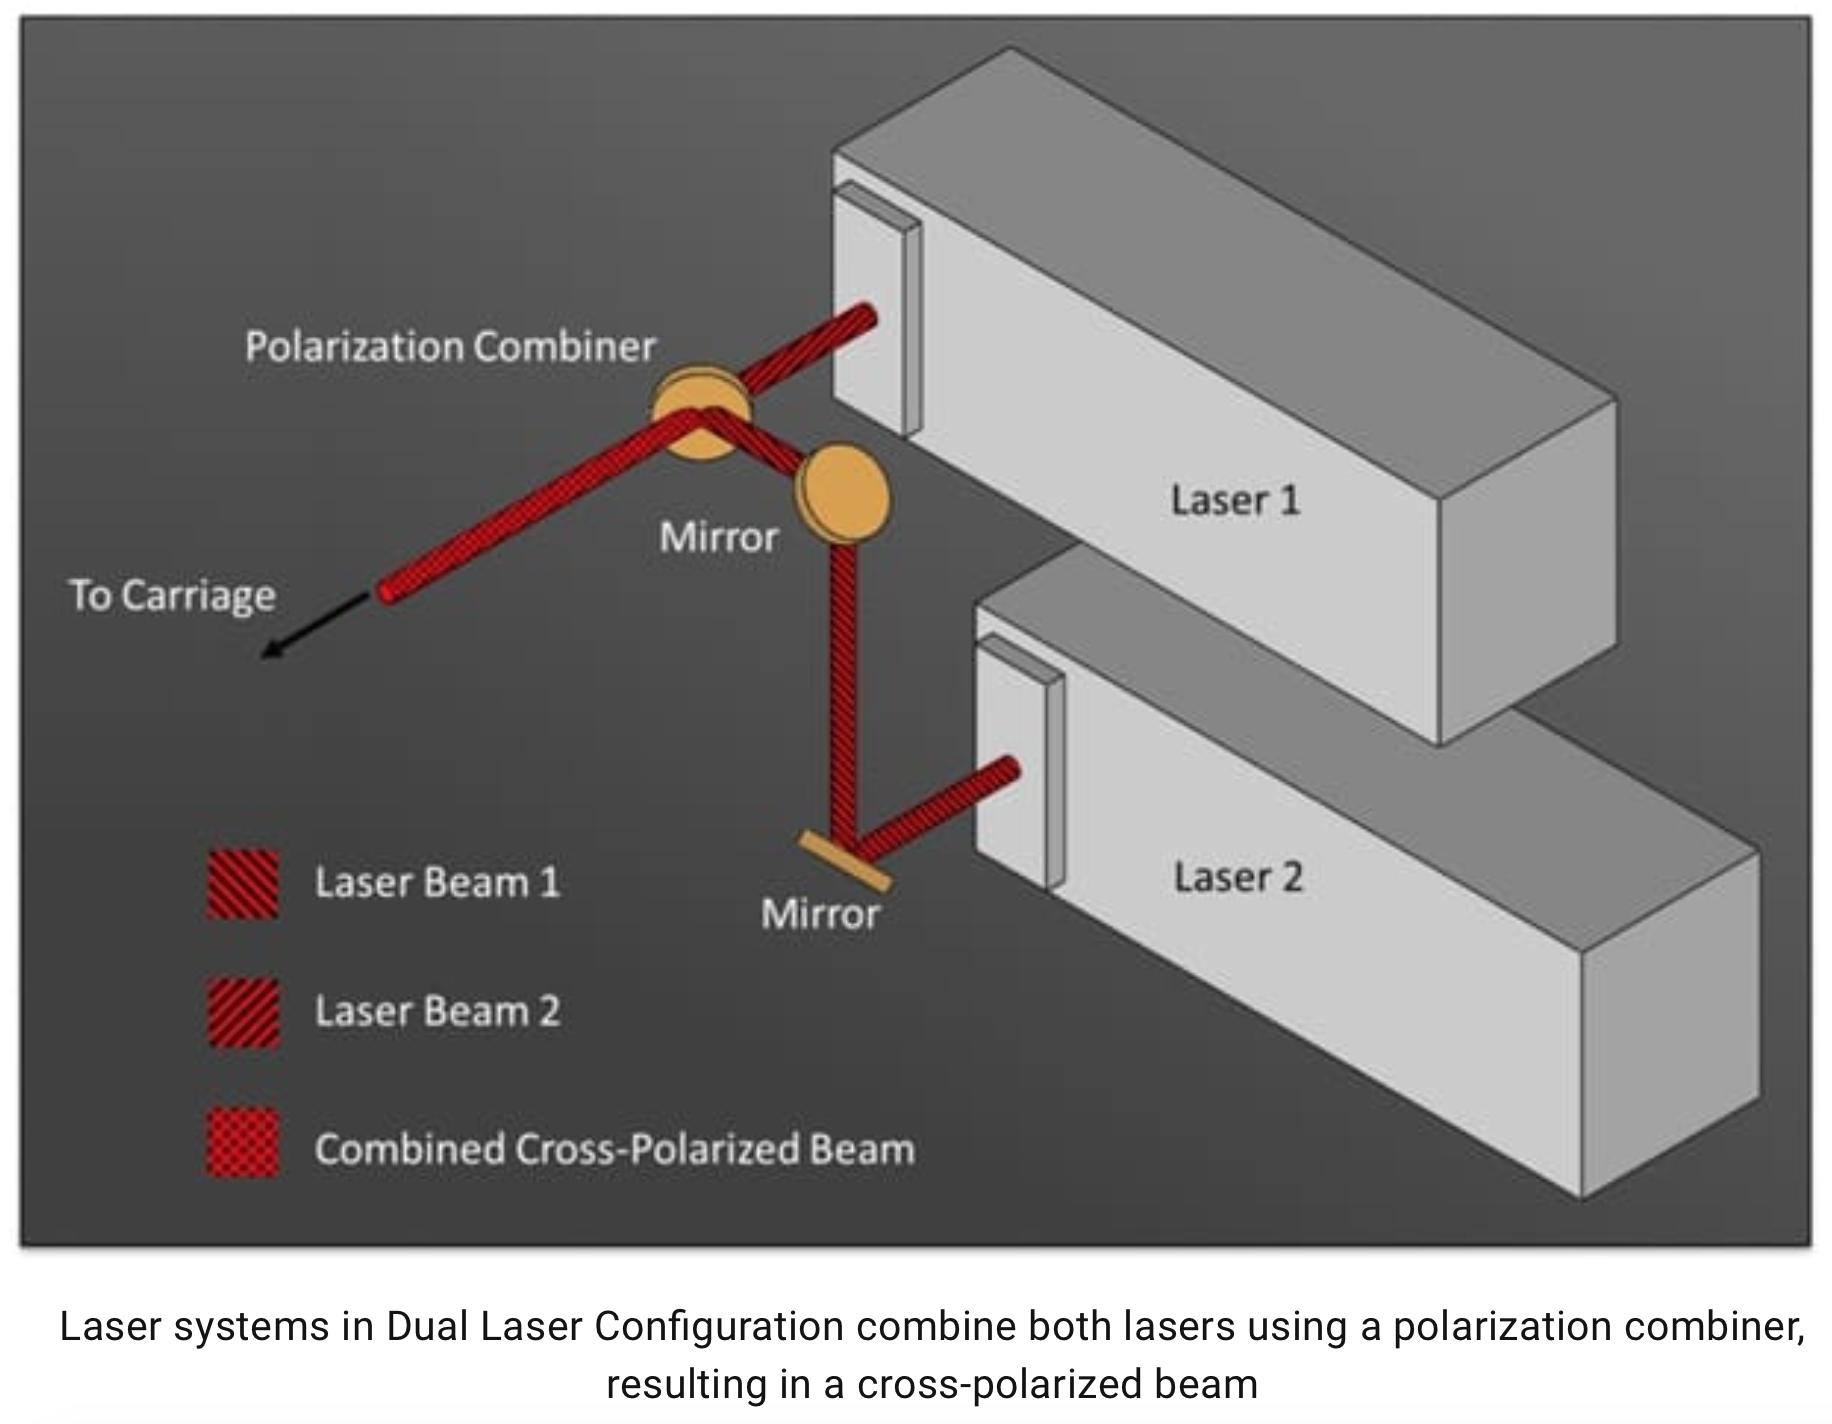 Dual Laser Configuration